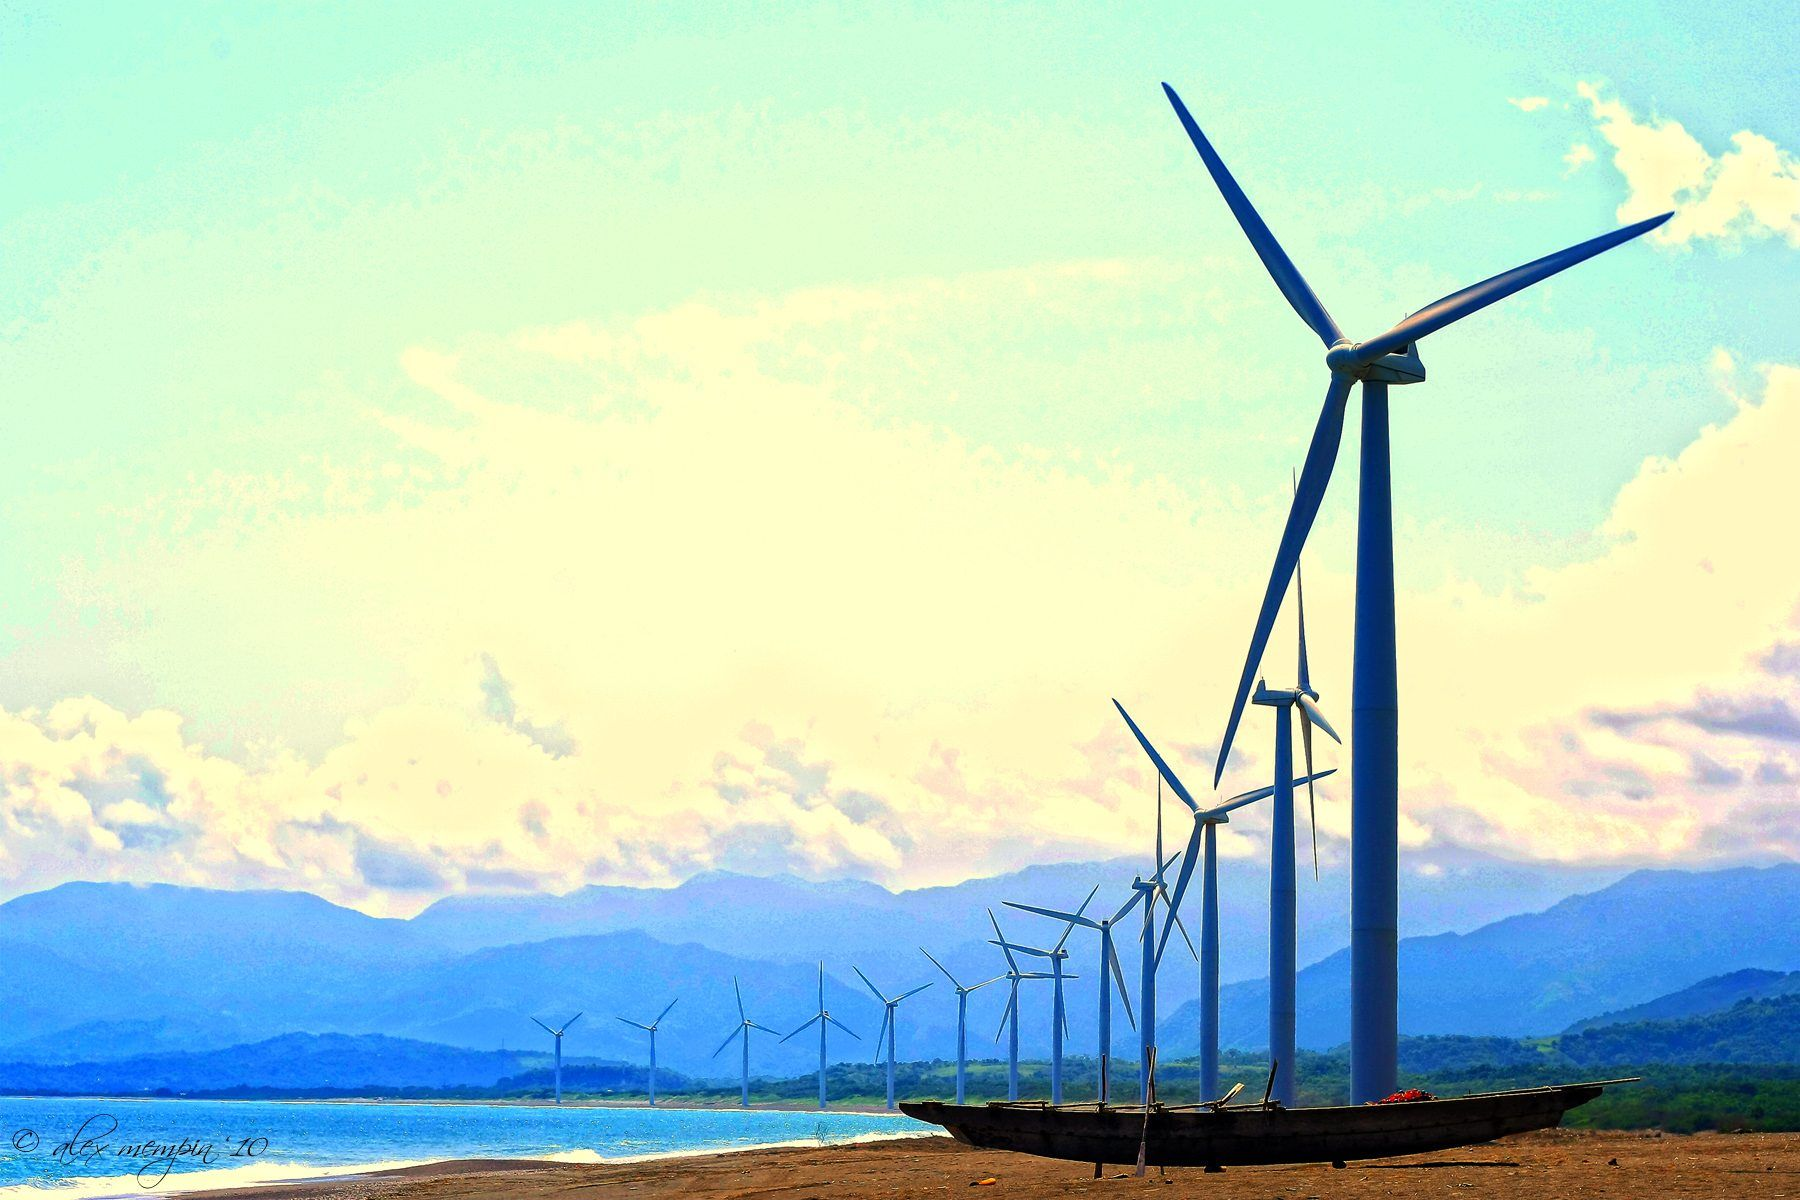 Pin On Windmills And Wind Turbines 2